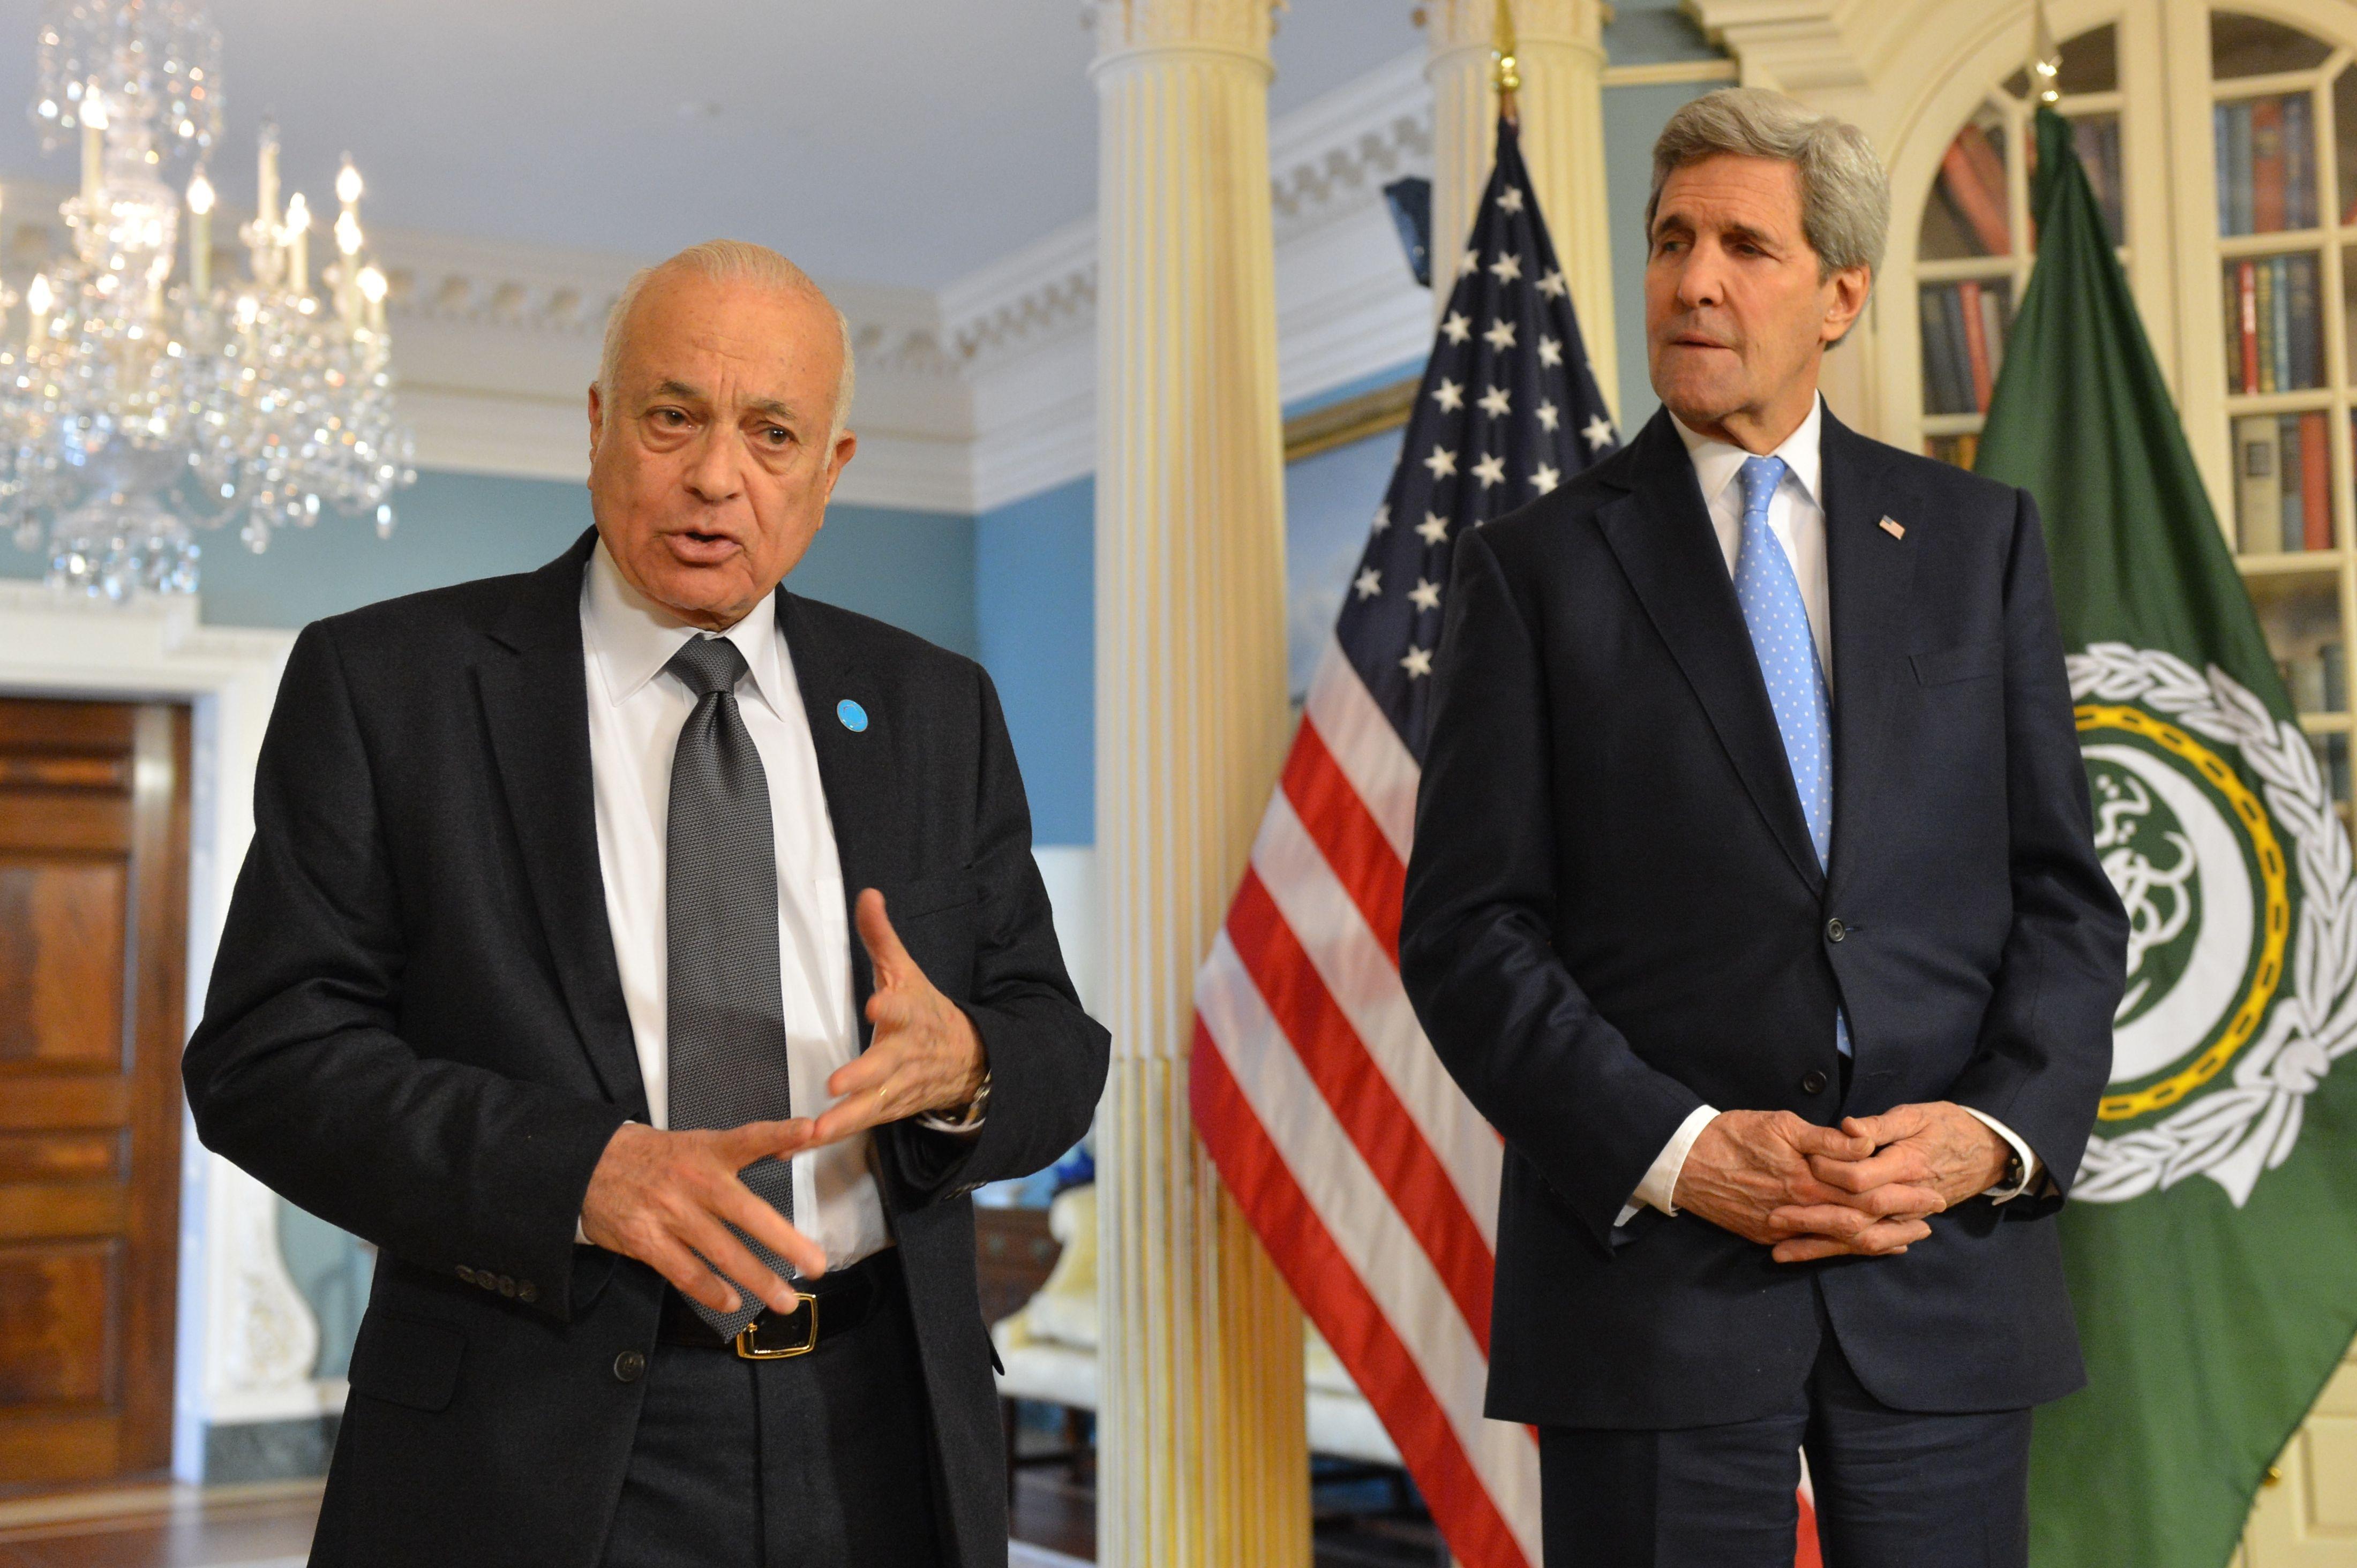 secretary-kerry-meeting-with-arab-league-secretary-general-elaraby-at-white-house-summit-cve-